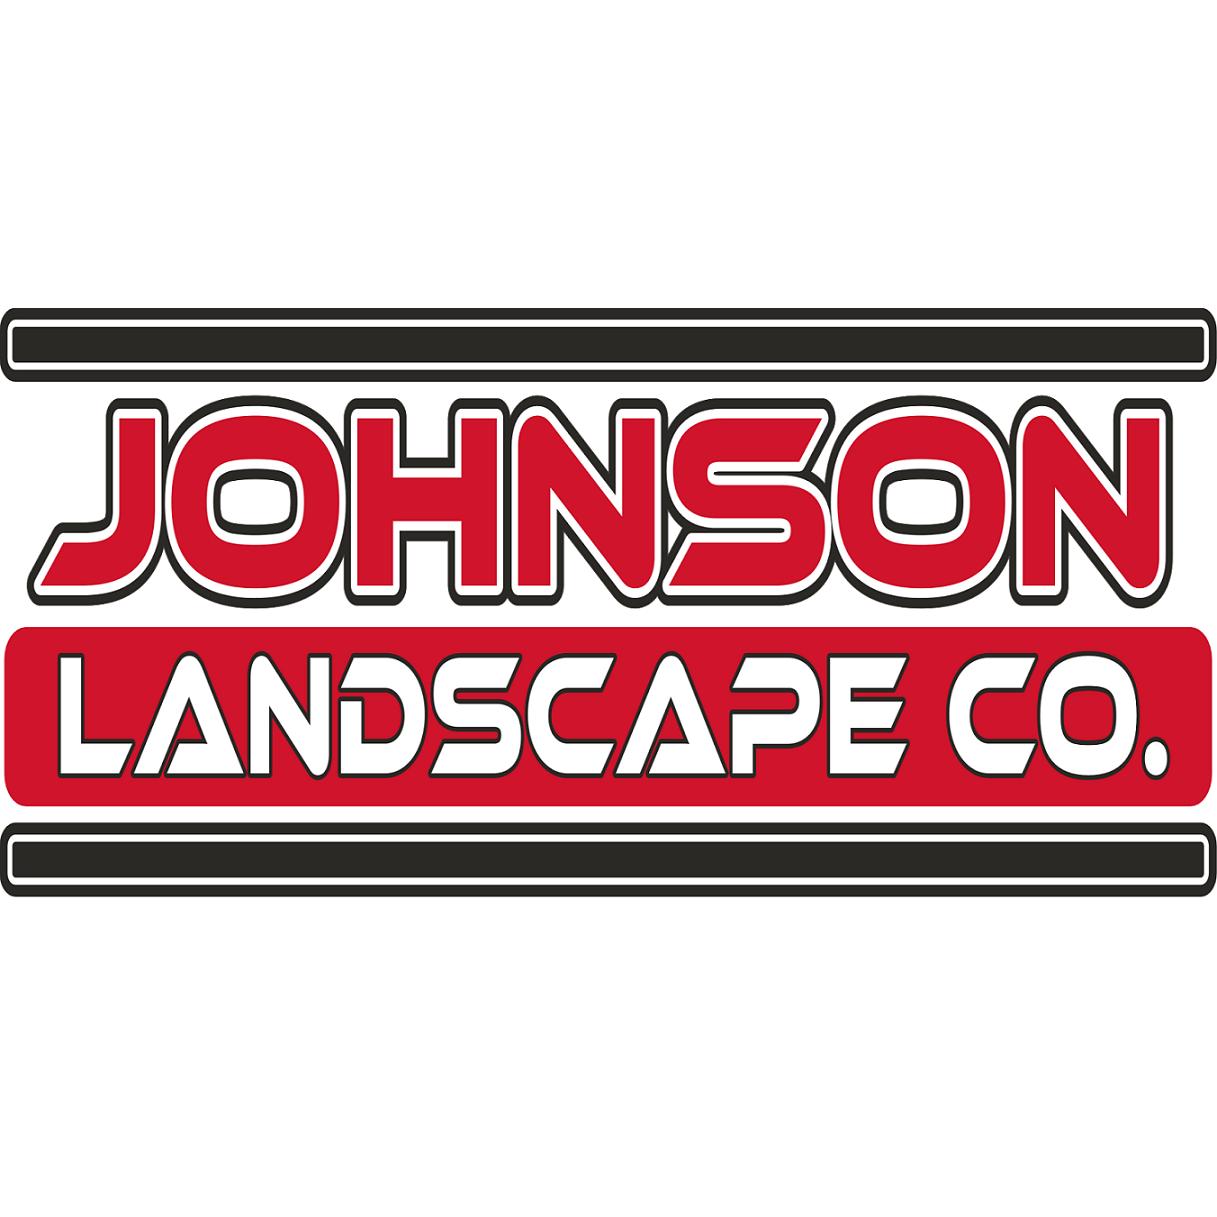 Johnson Landscape Co.